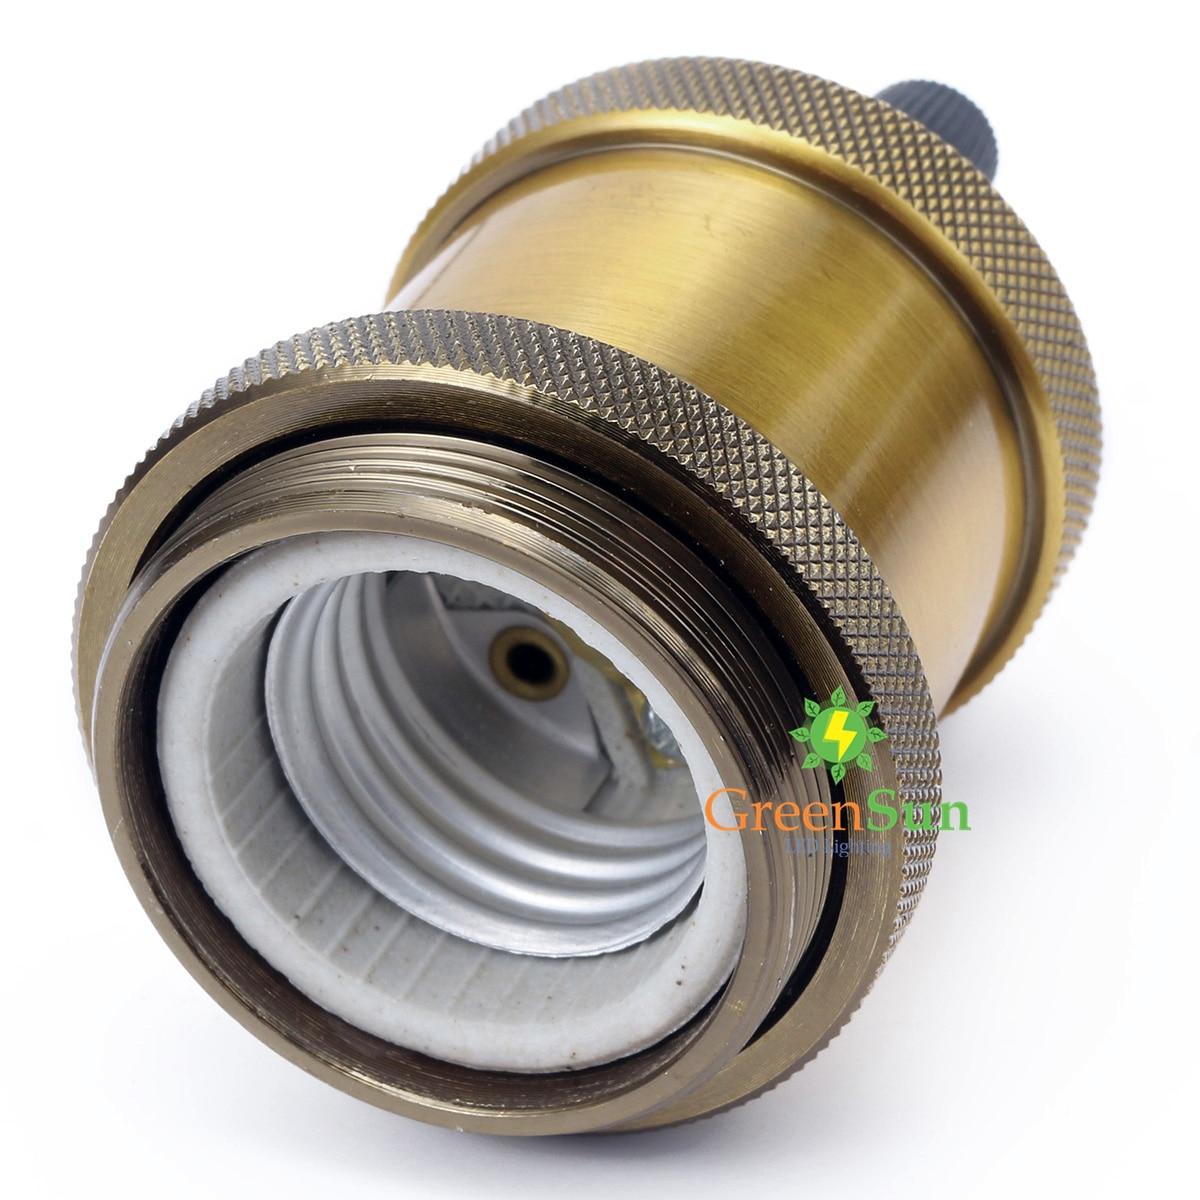 Bases da Lâmpada e27 lâmpada base da lâmpada Material : Aluminum + Pottery And Porcelain